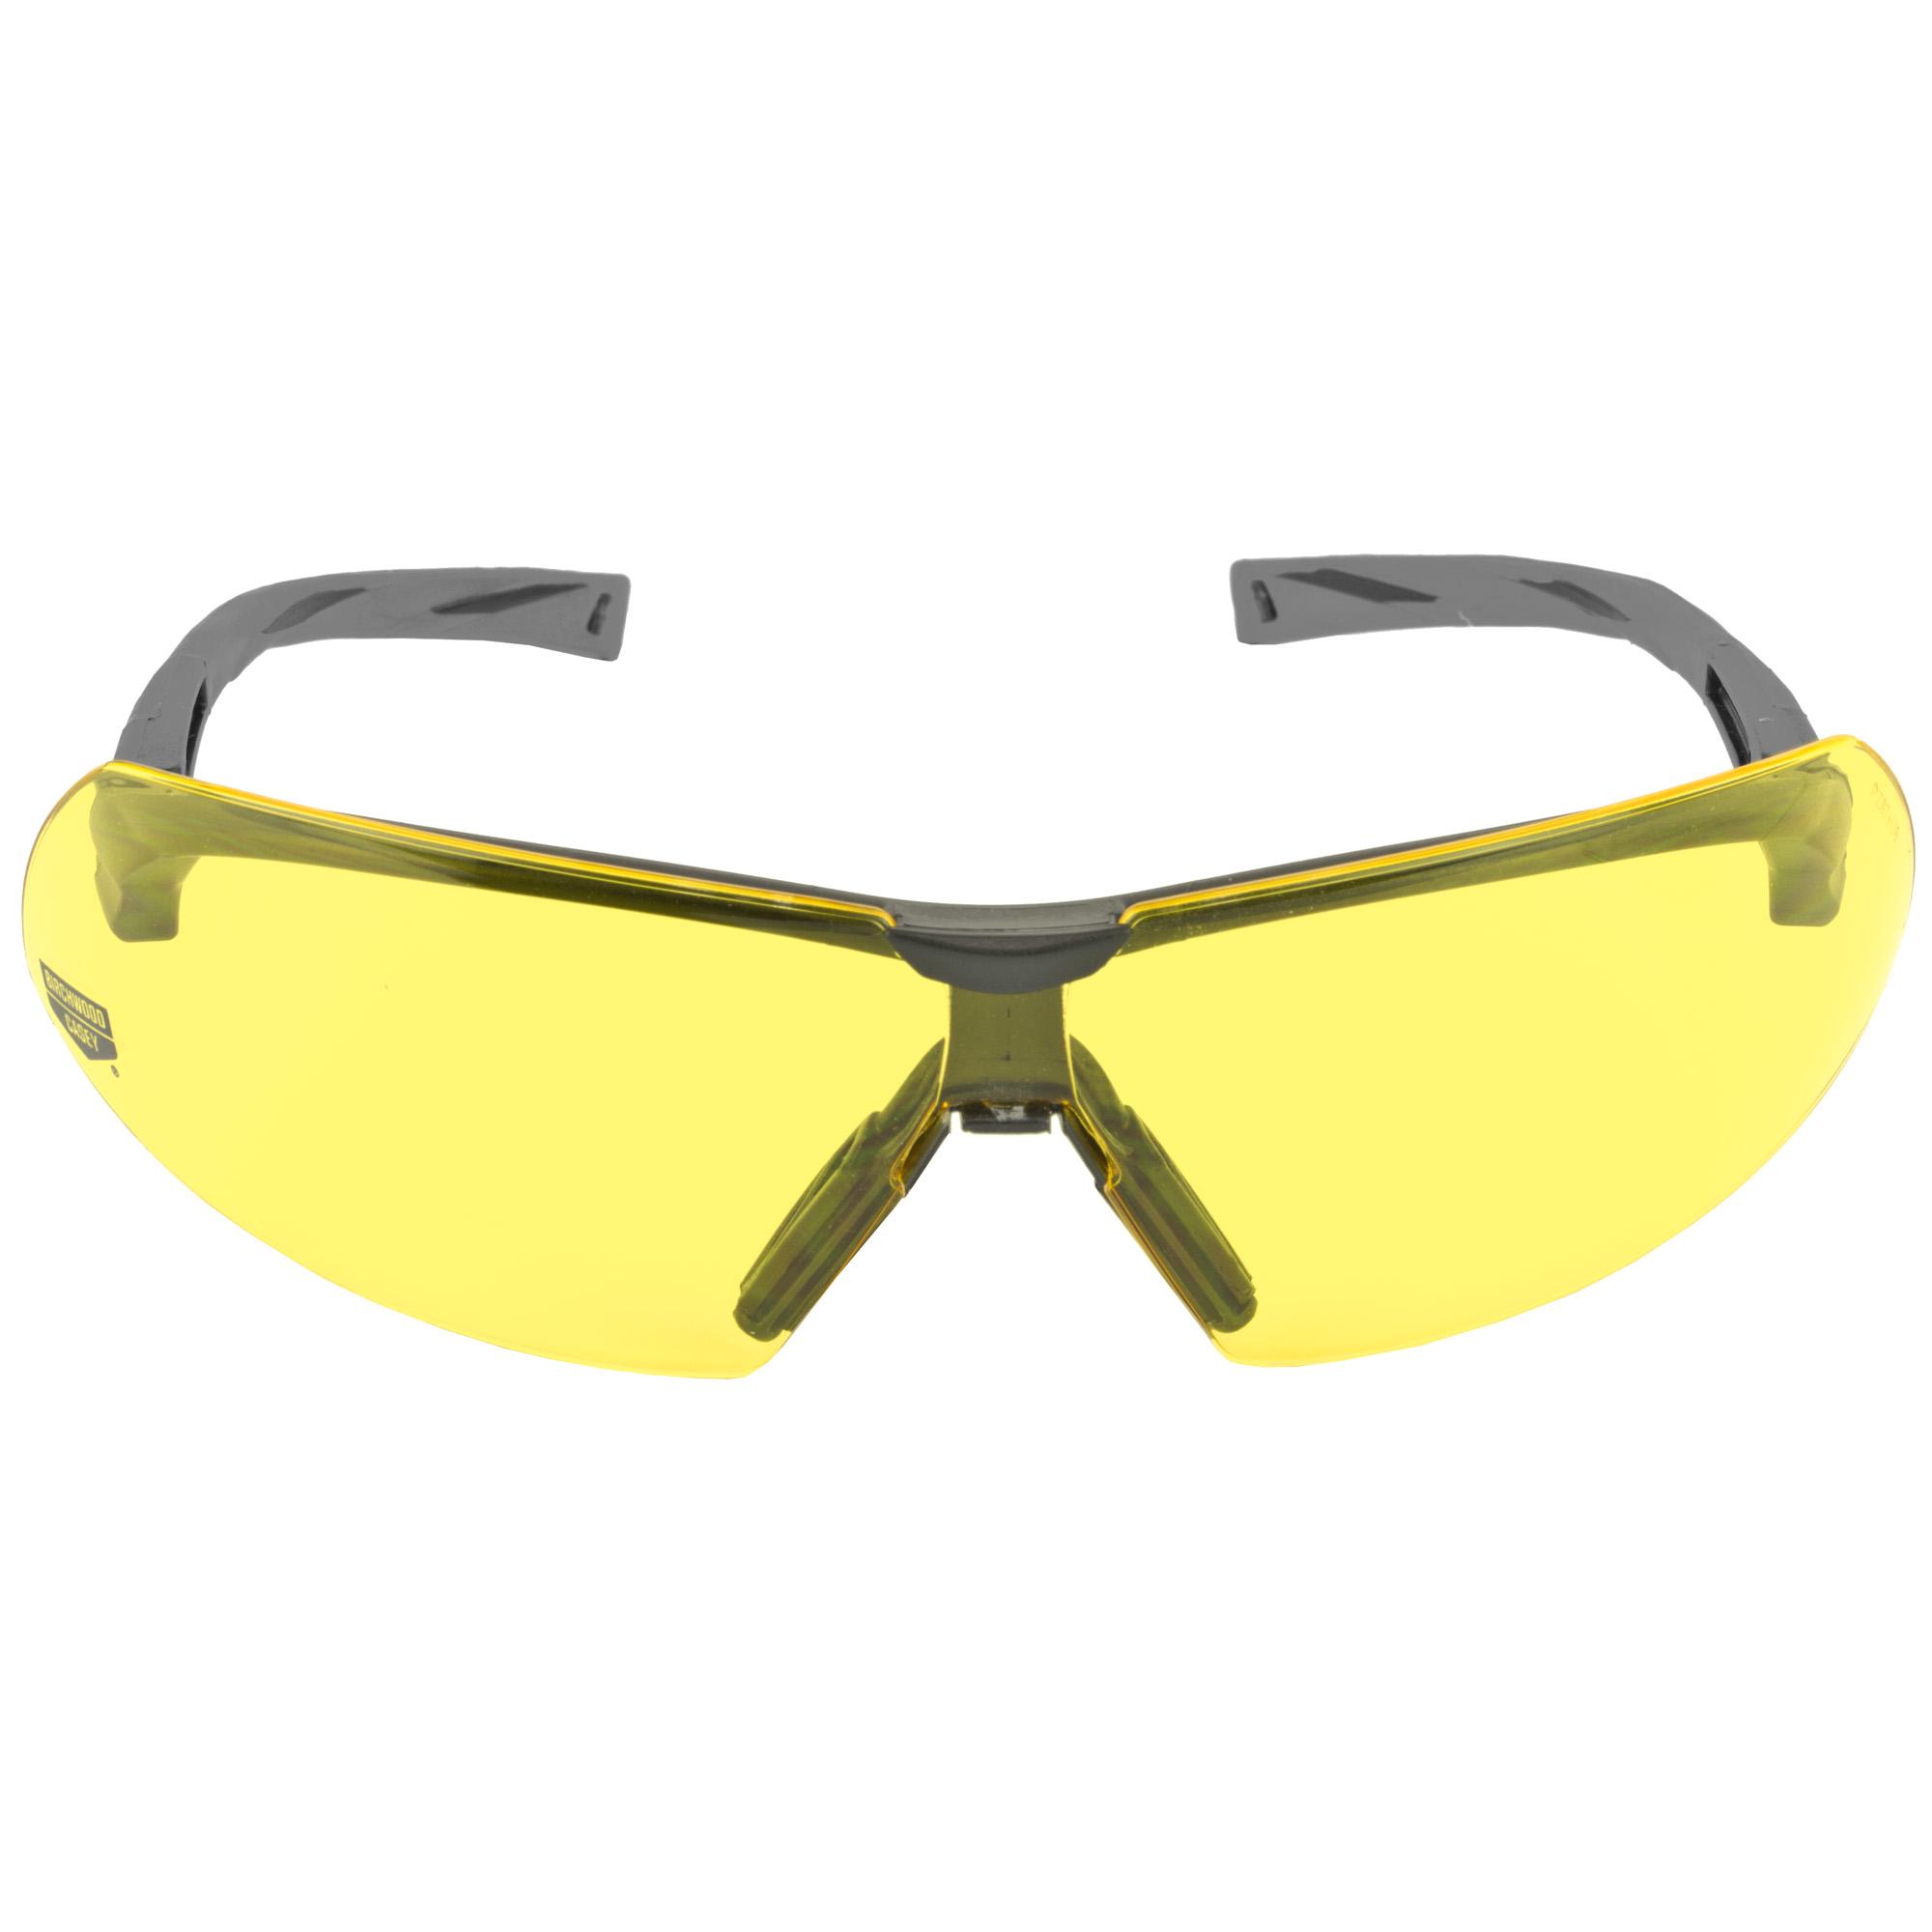 B/c Skyte Shooting Glasses Yellow